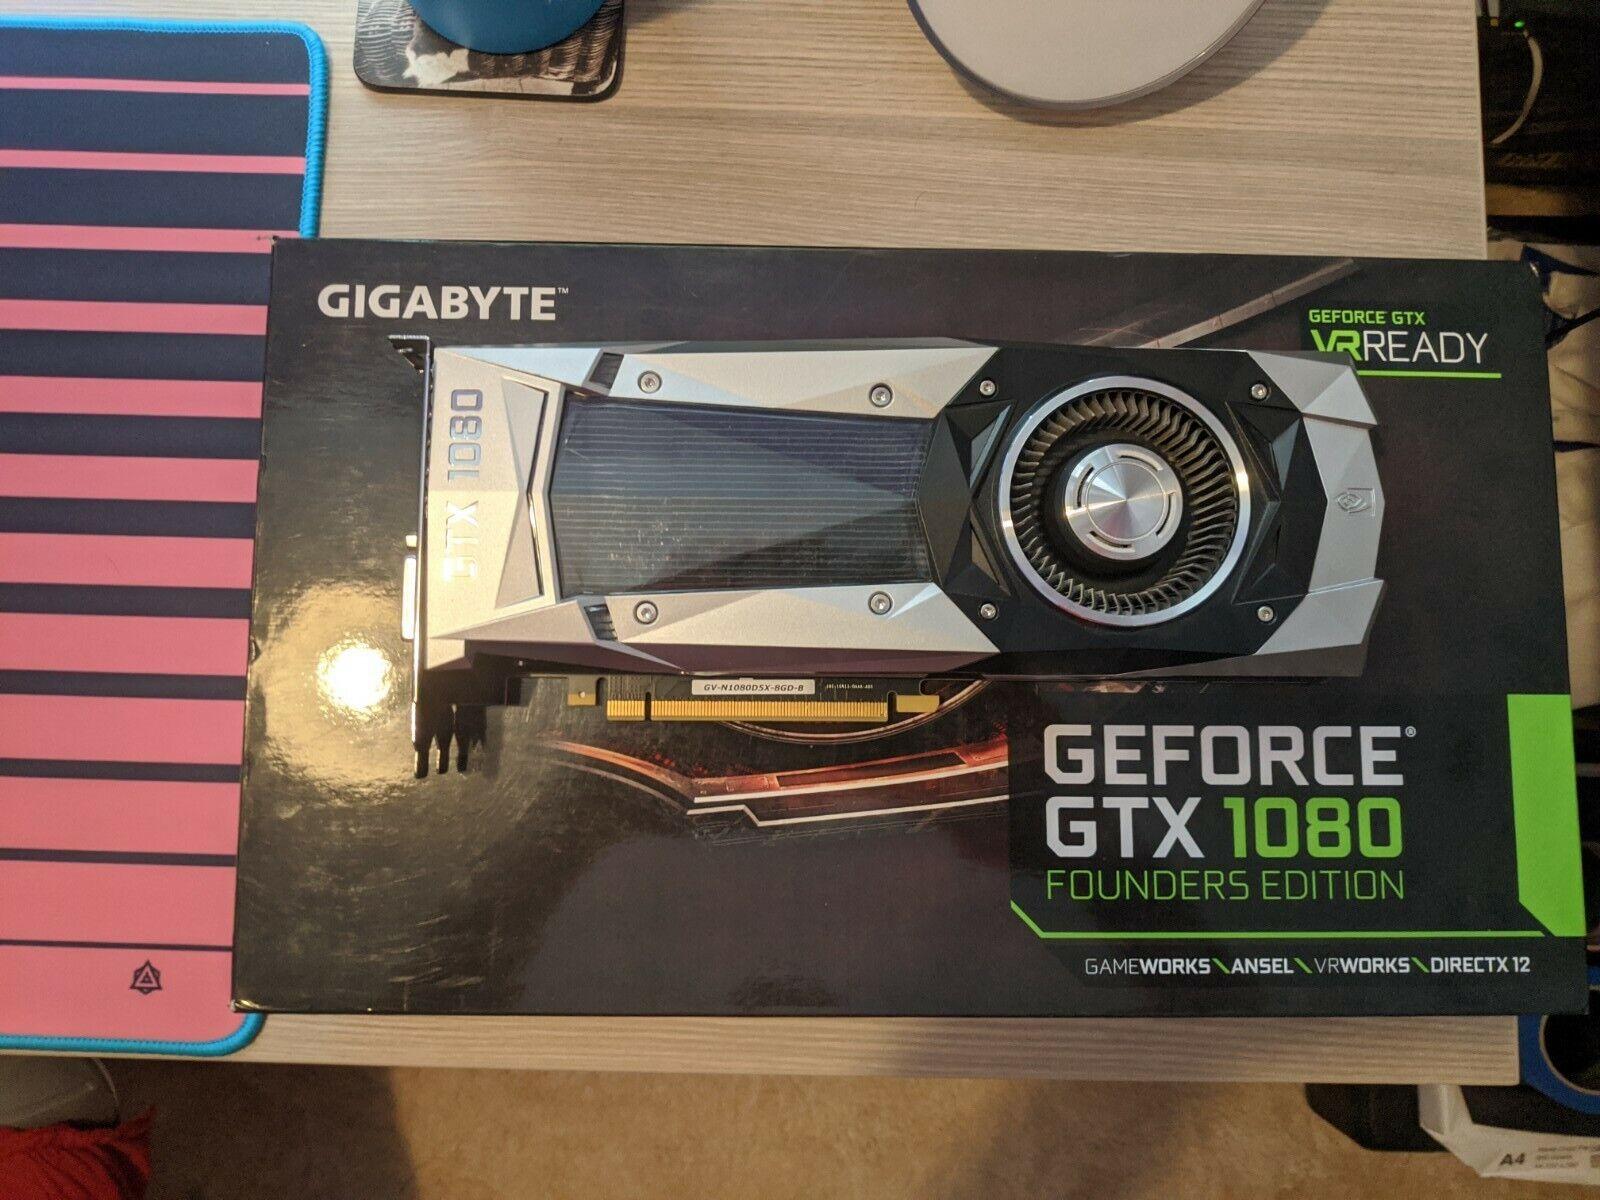 Gigabyte Nvidia GTX 1080 8GB FE Founder's Edition GPU Graphics Card